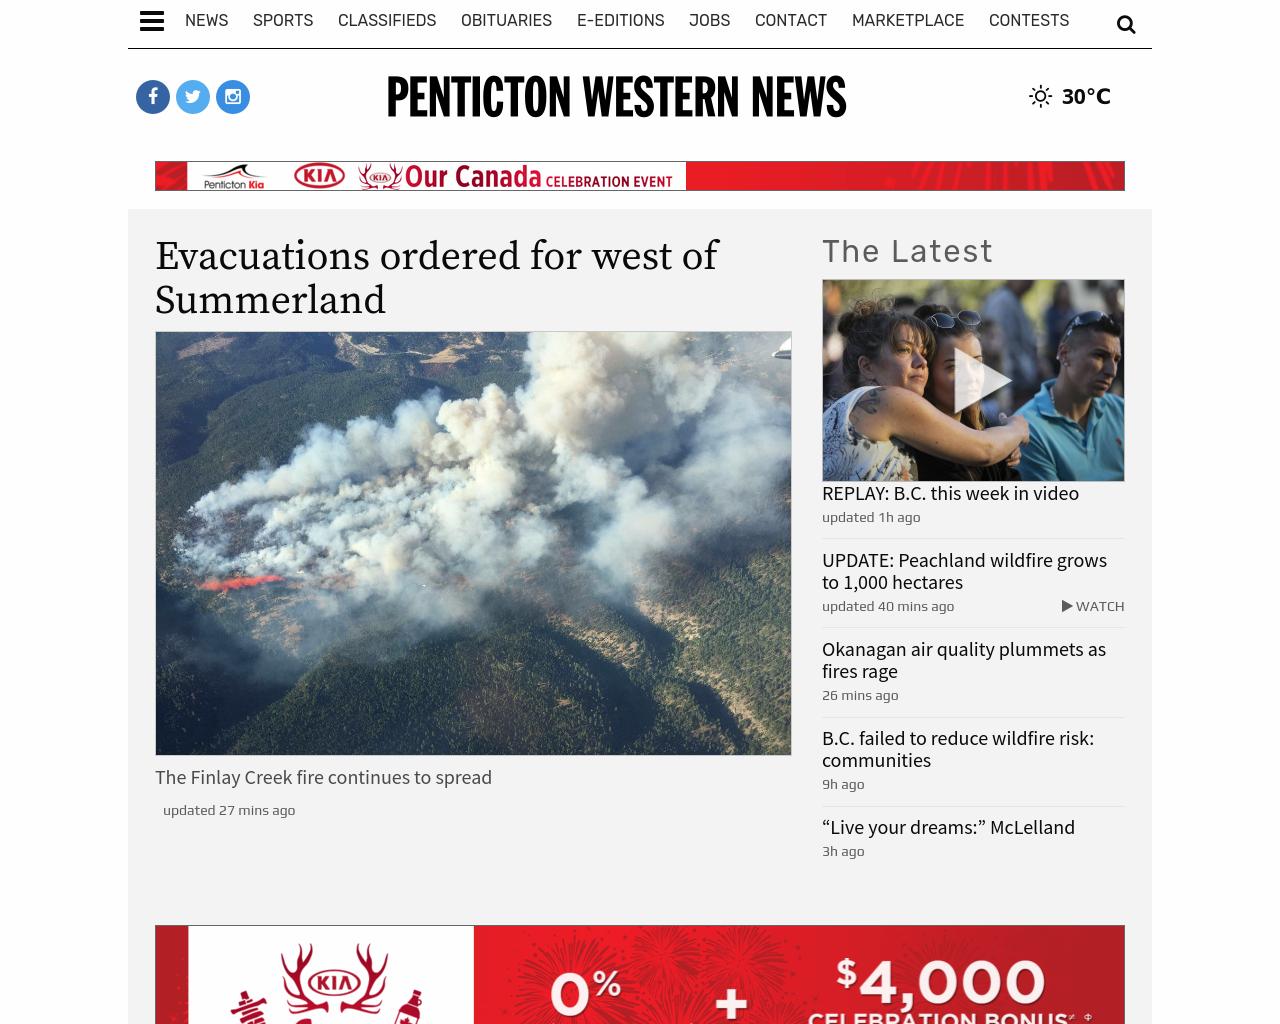 Penticton-Western-News-Advertising-Reviews-Pricing